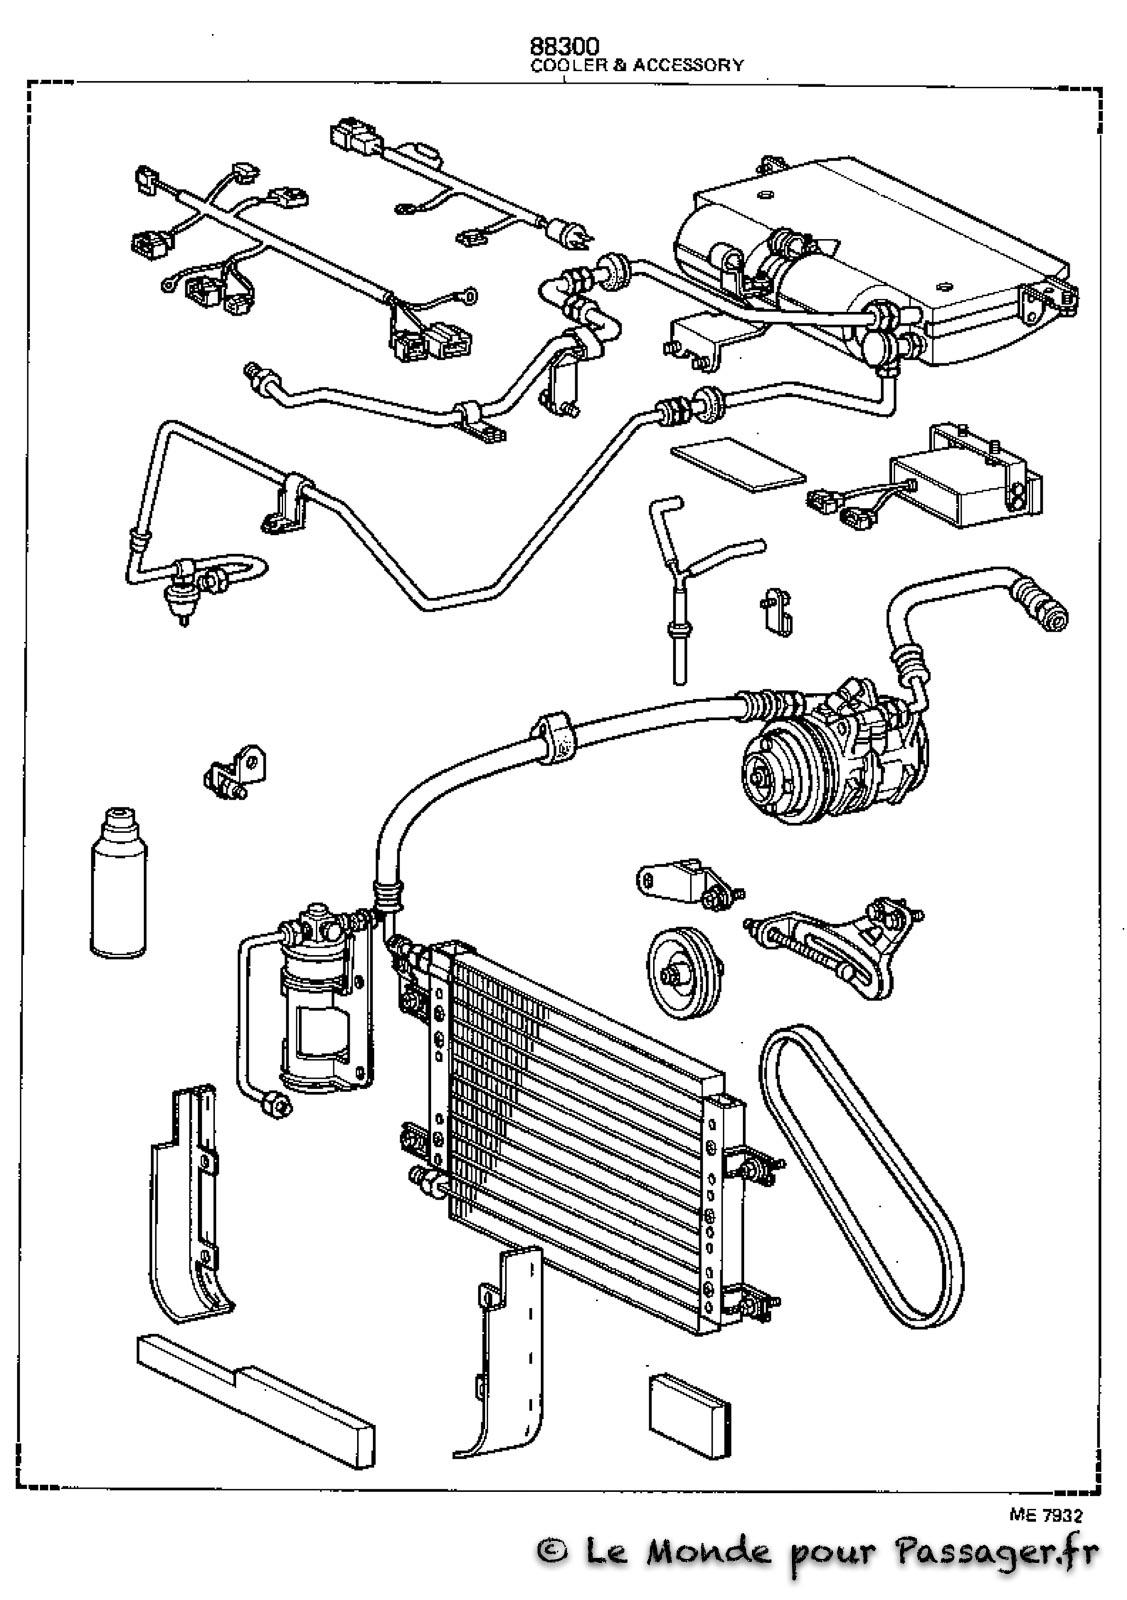 Fj55-Eclatés-Techniques115